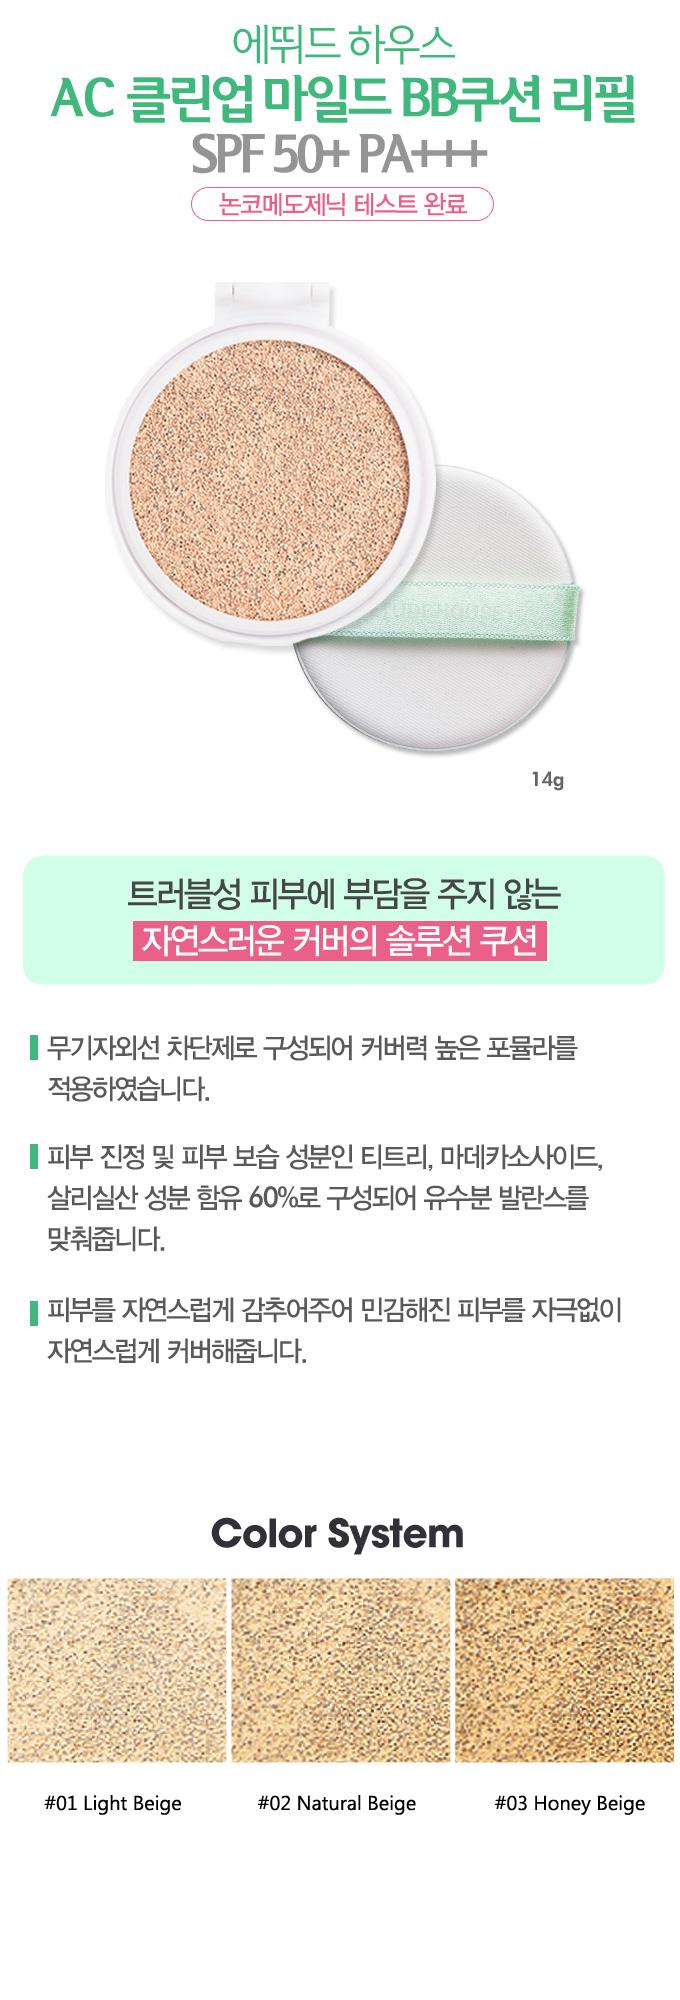 Index Of Jjj Image Cosmetics Etudehouse Eng Ac Clean Up Bb Cushion Natural Beige